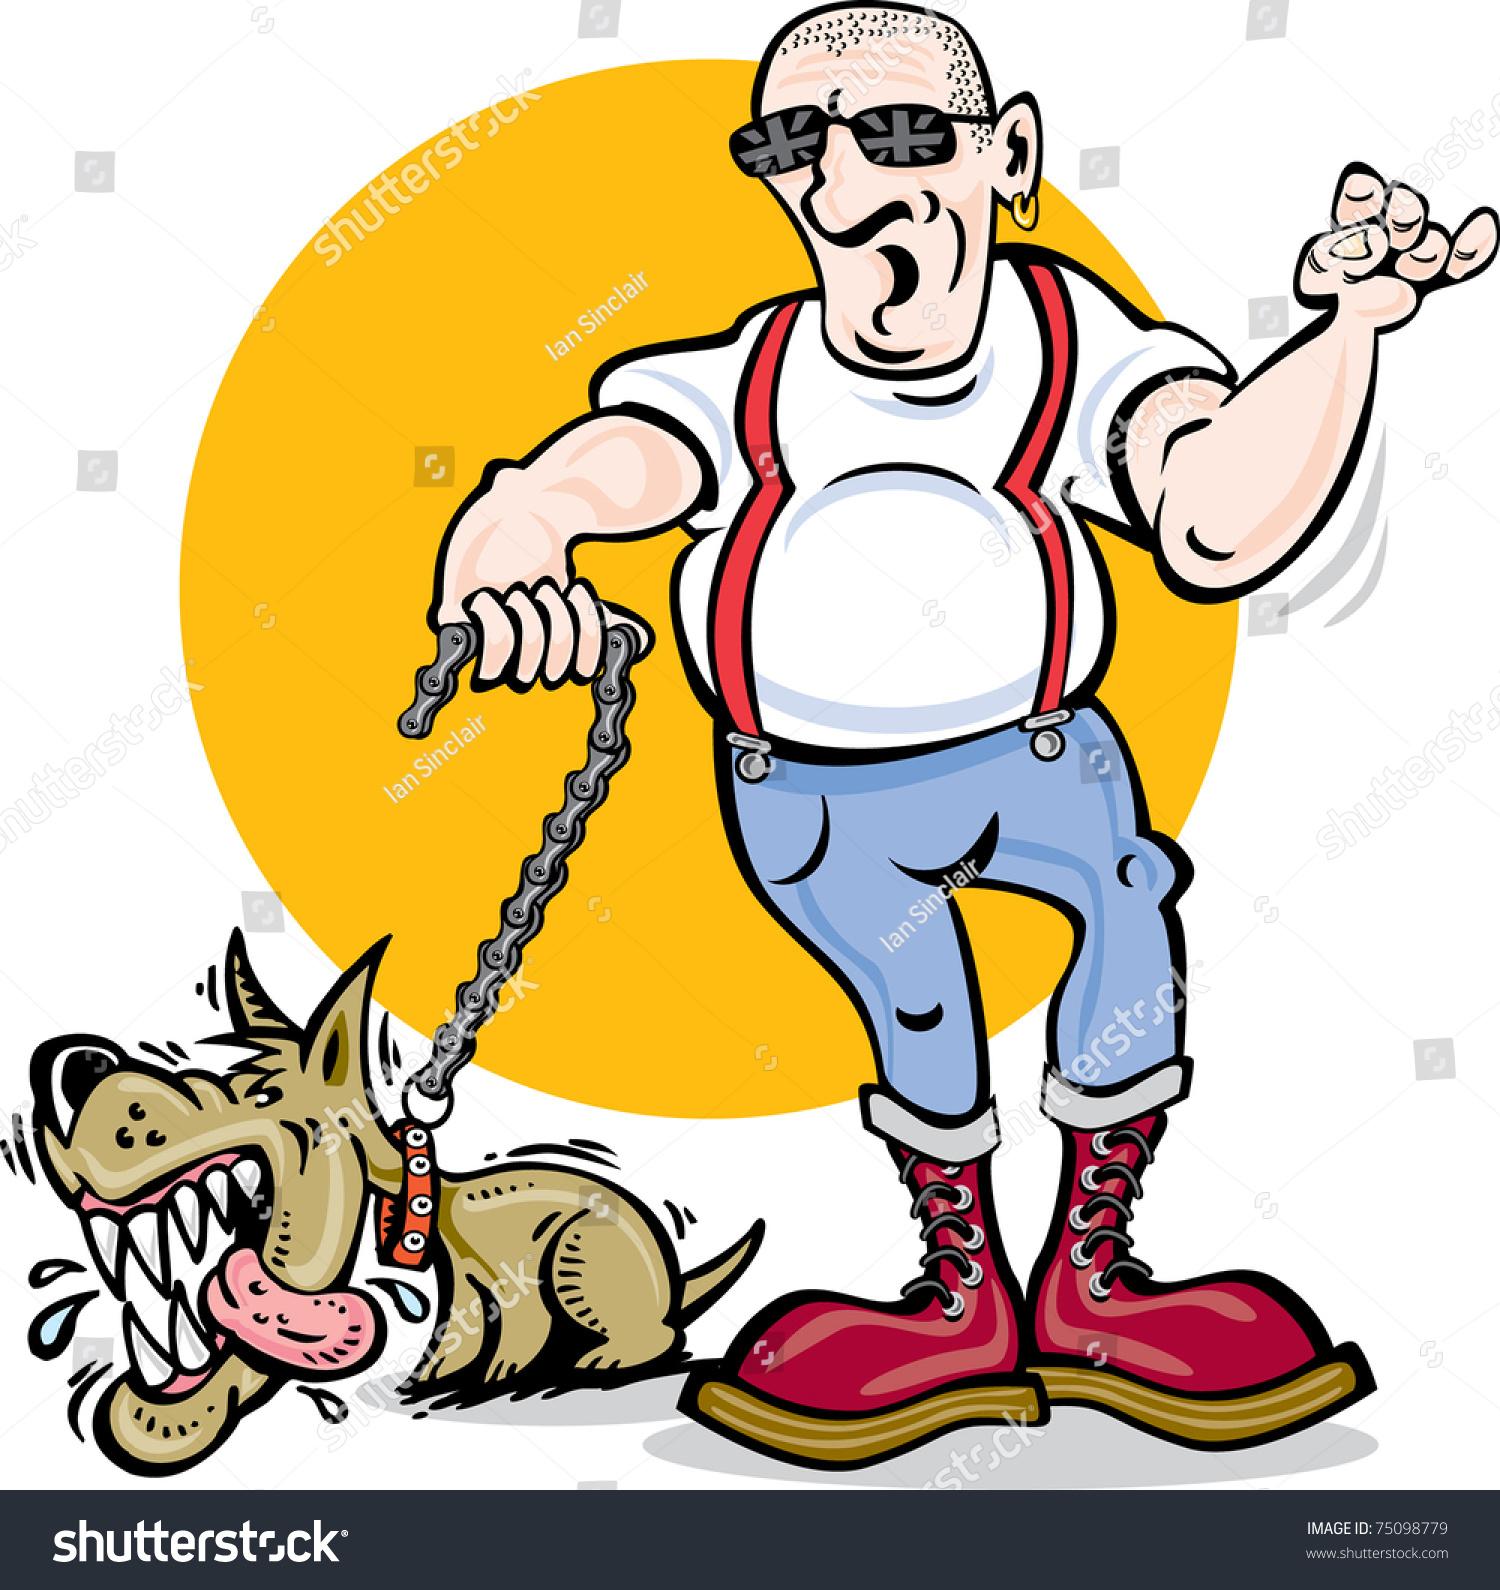 Cartoon vector of skinhead and mad dog skinhead dog